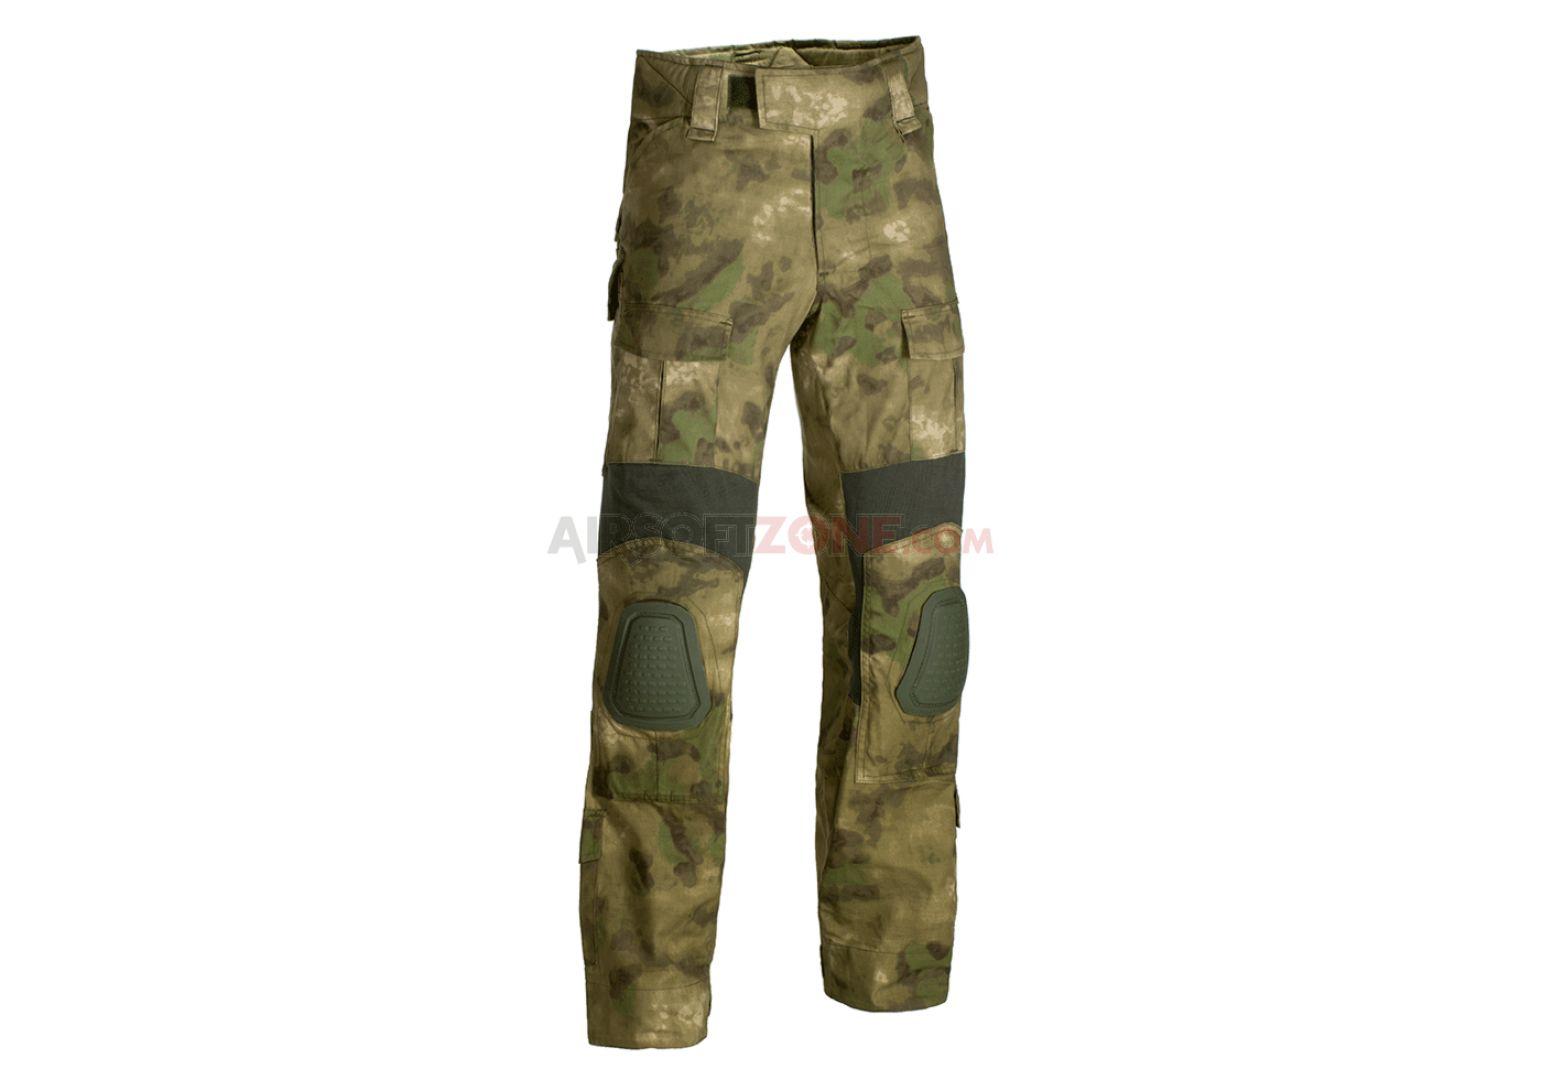 Predator combat pant Everglade A-tacs fg style